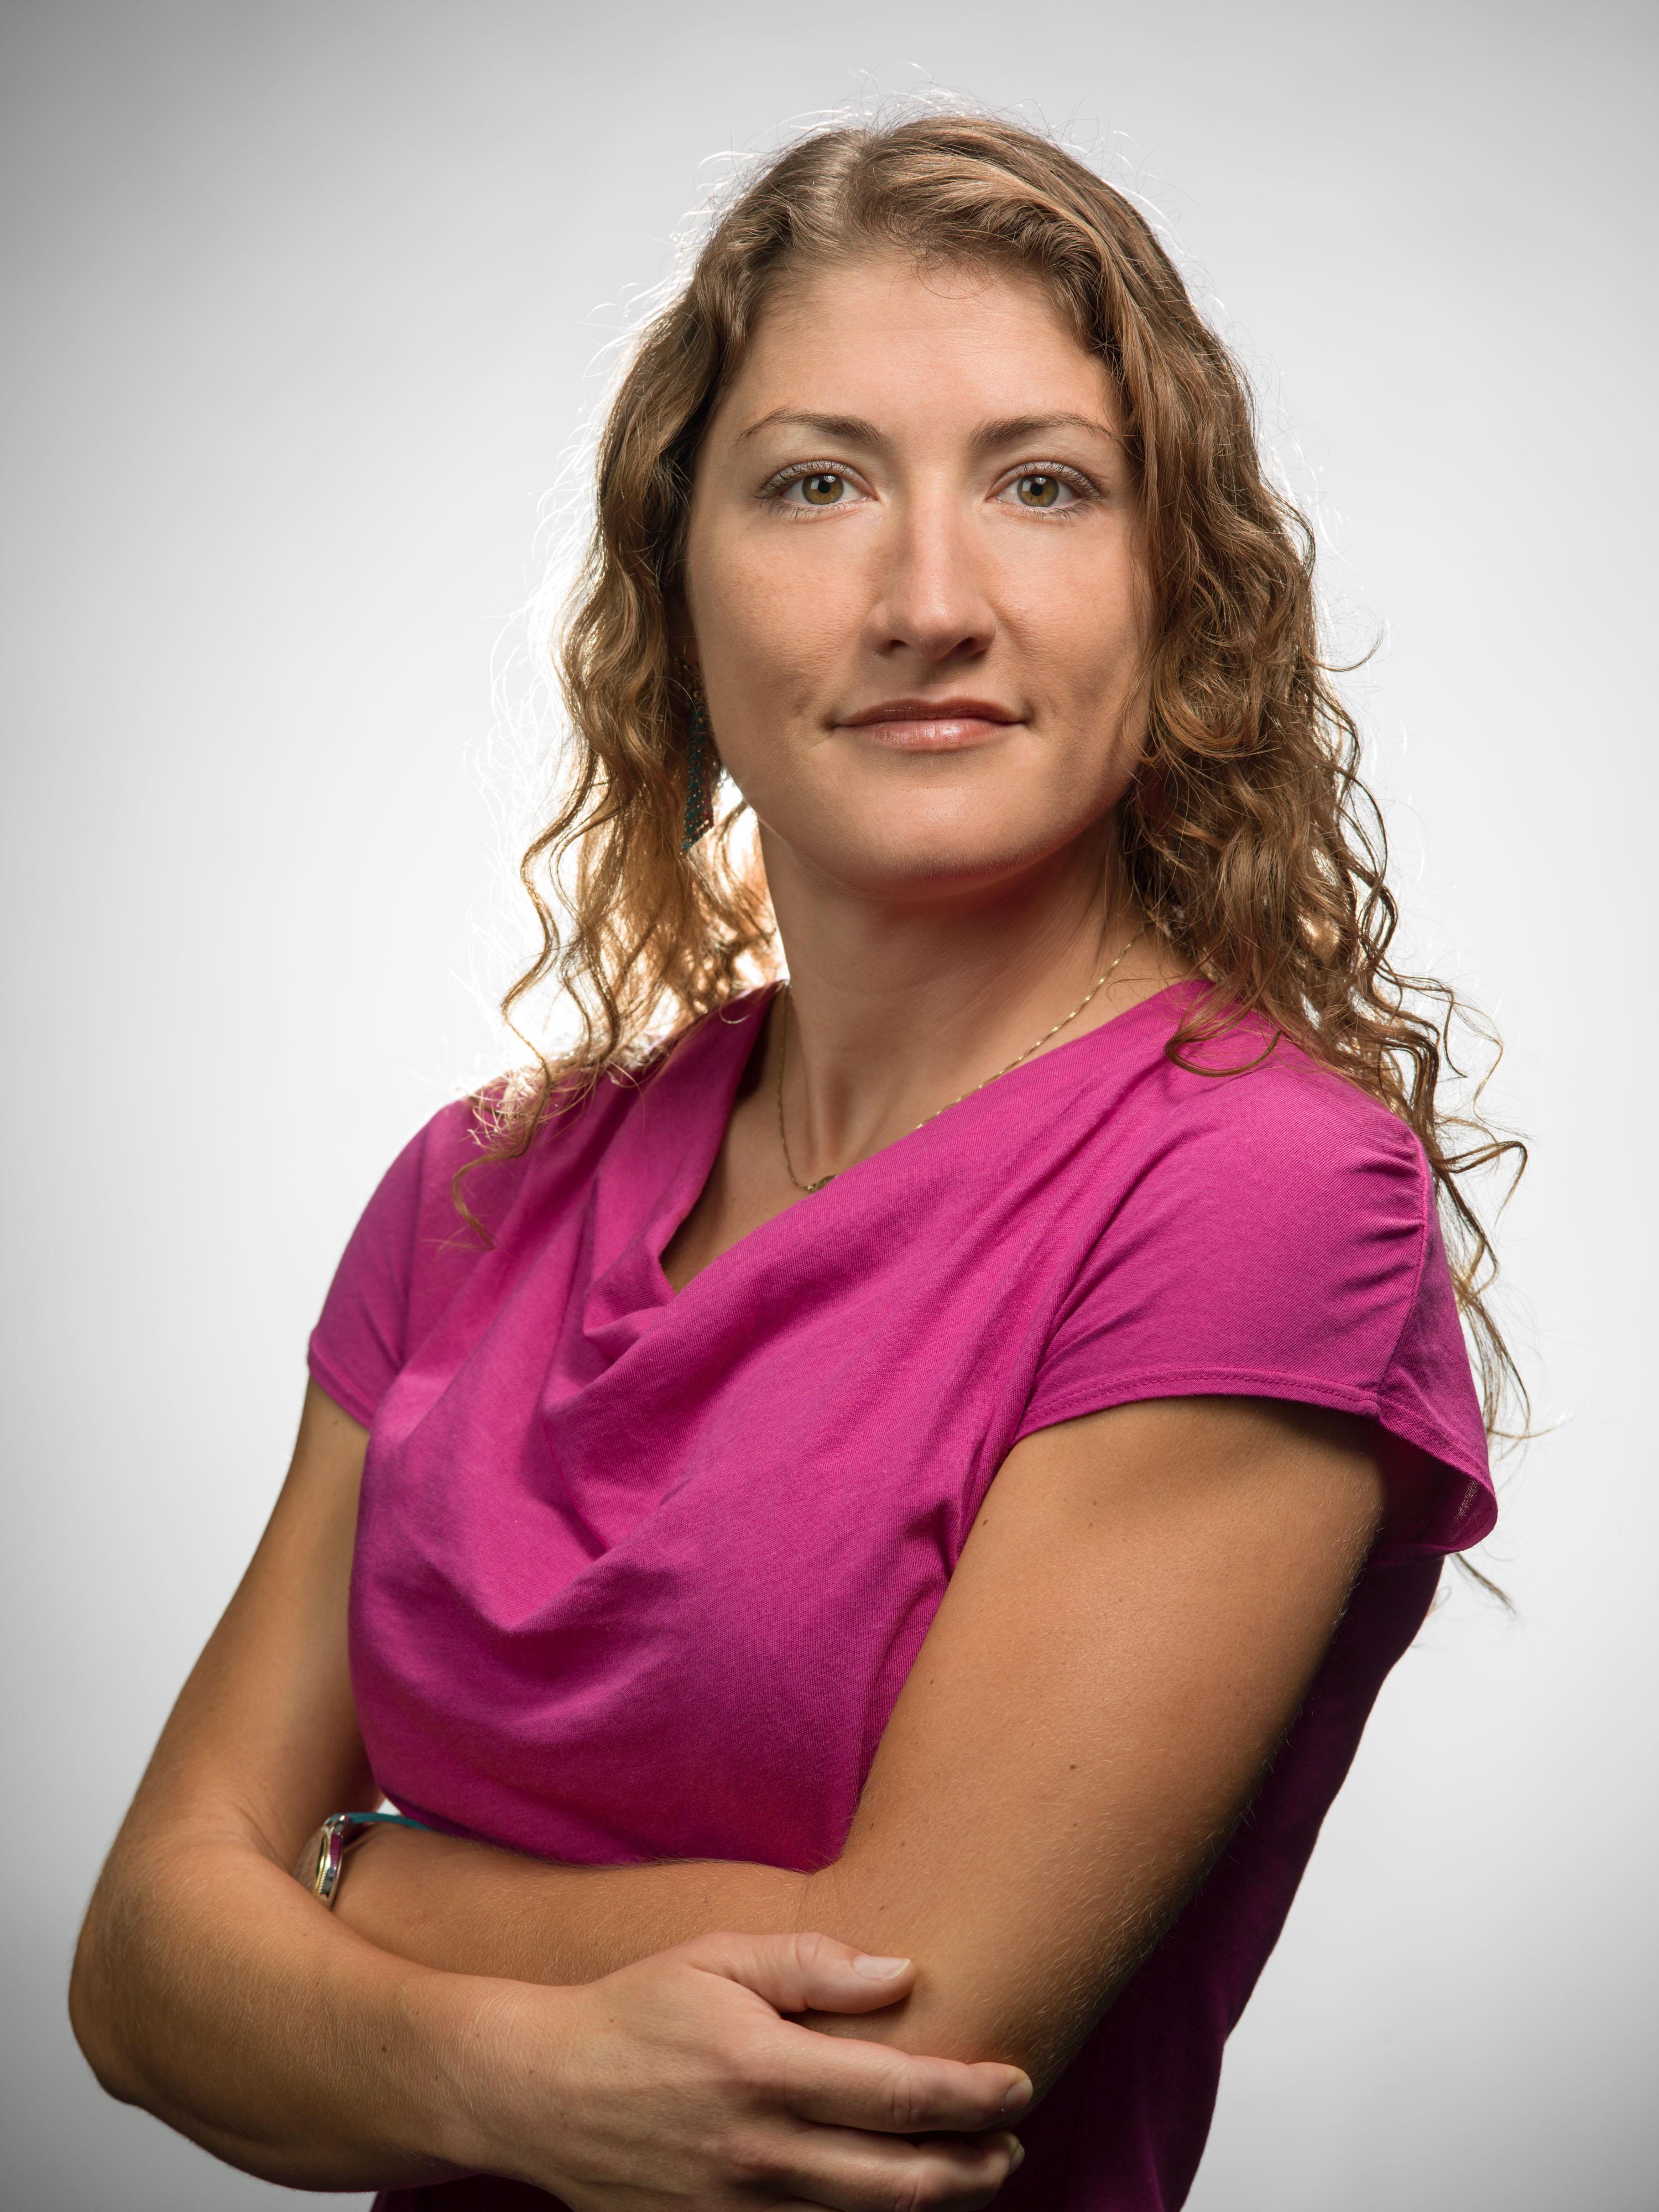 Astronaut Candidate Christina Hammock Nasa